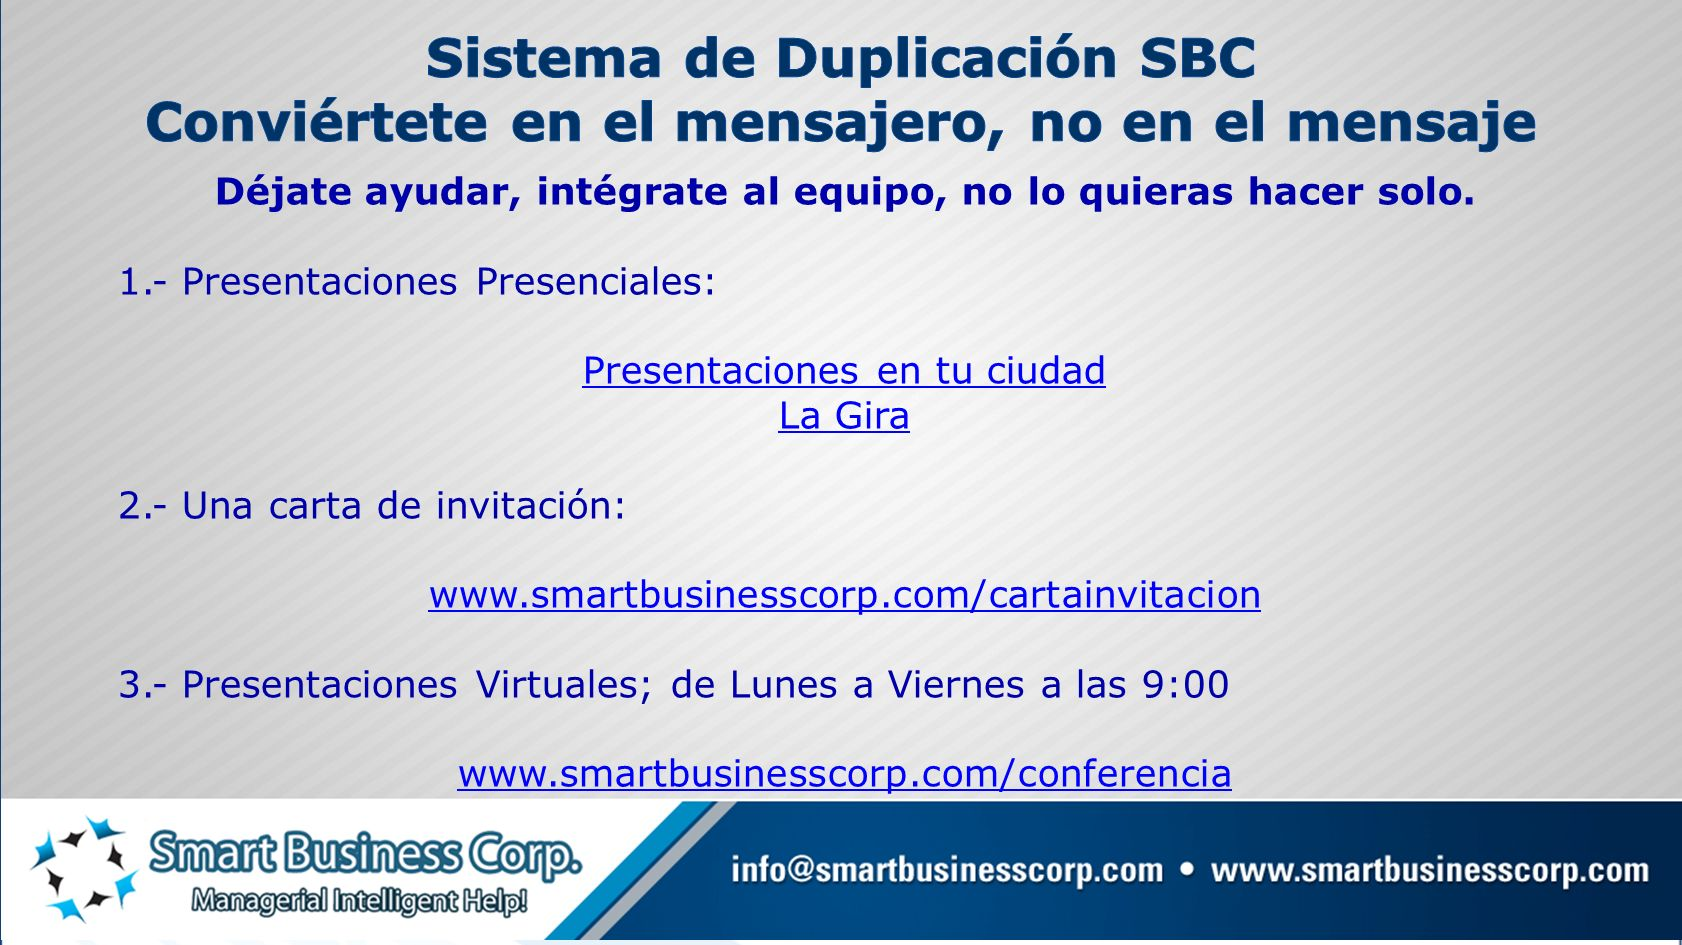 Sistema de Duplicación SBC